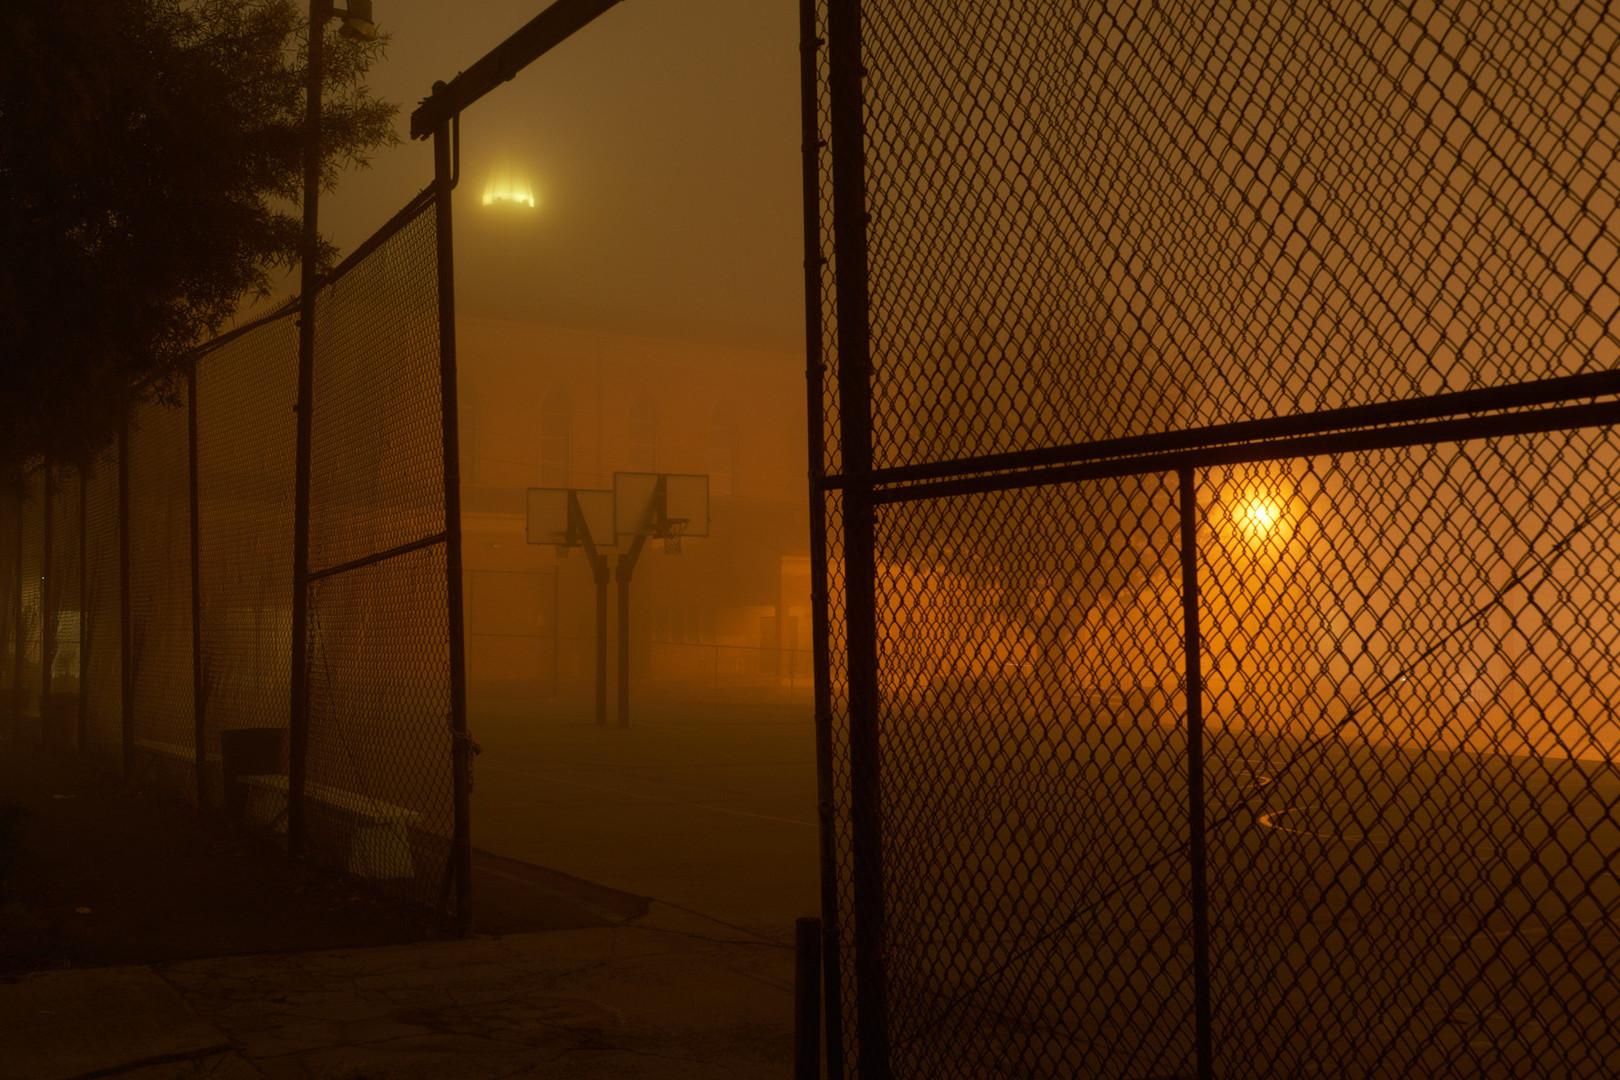 night_walk_3.jpg